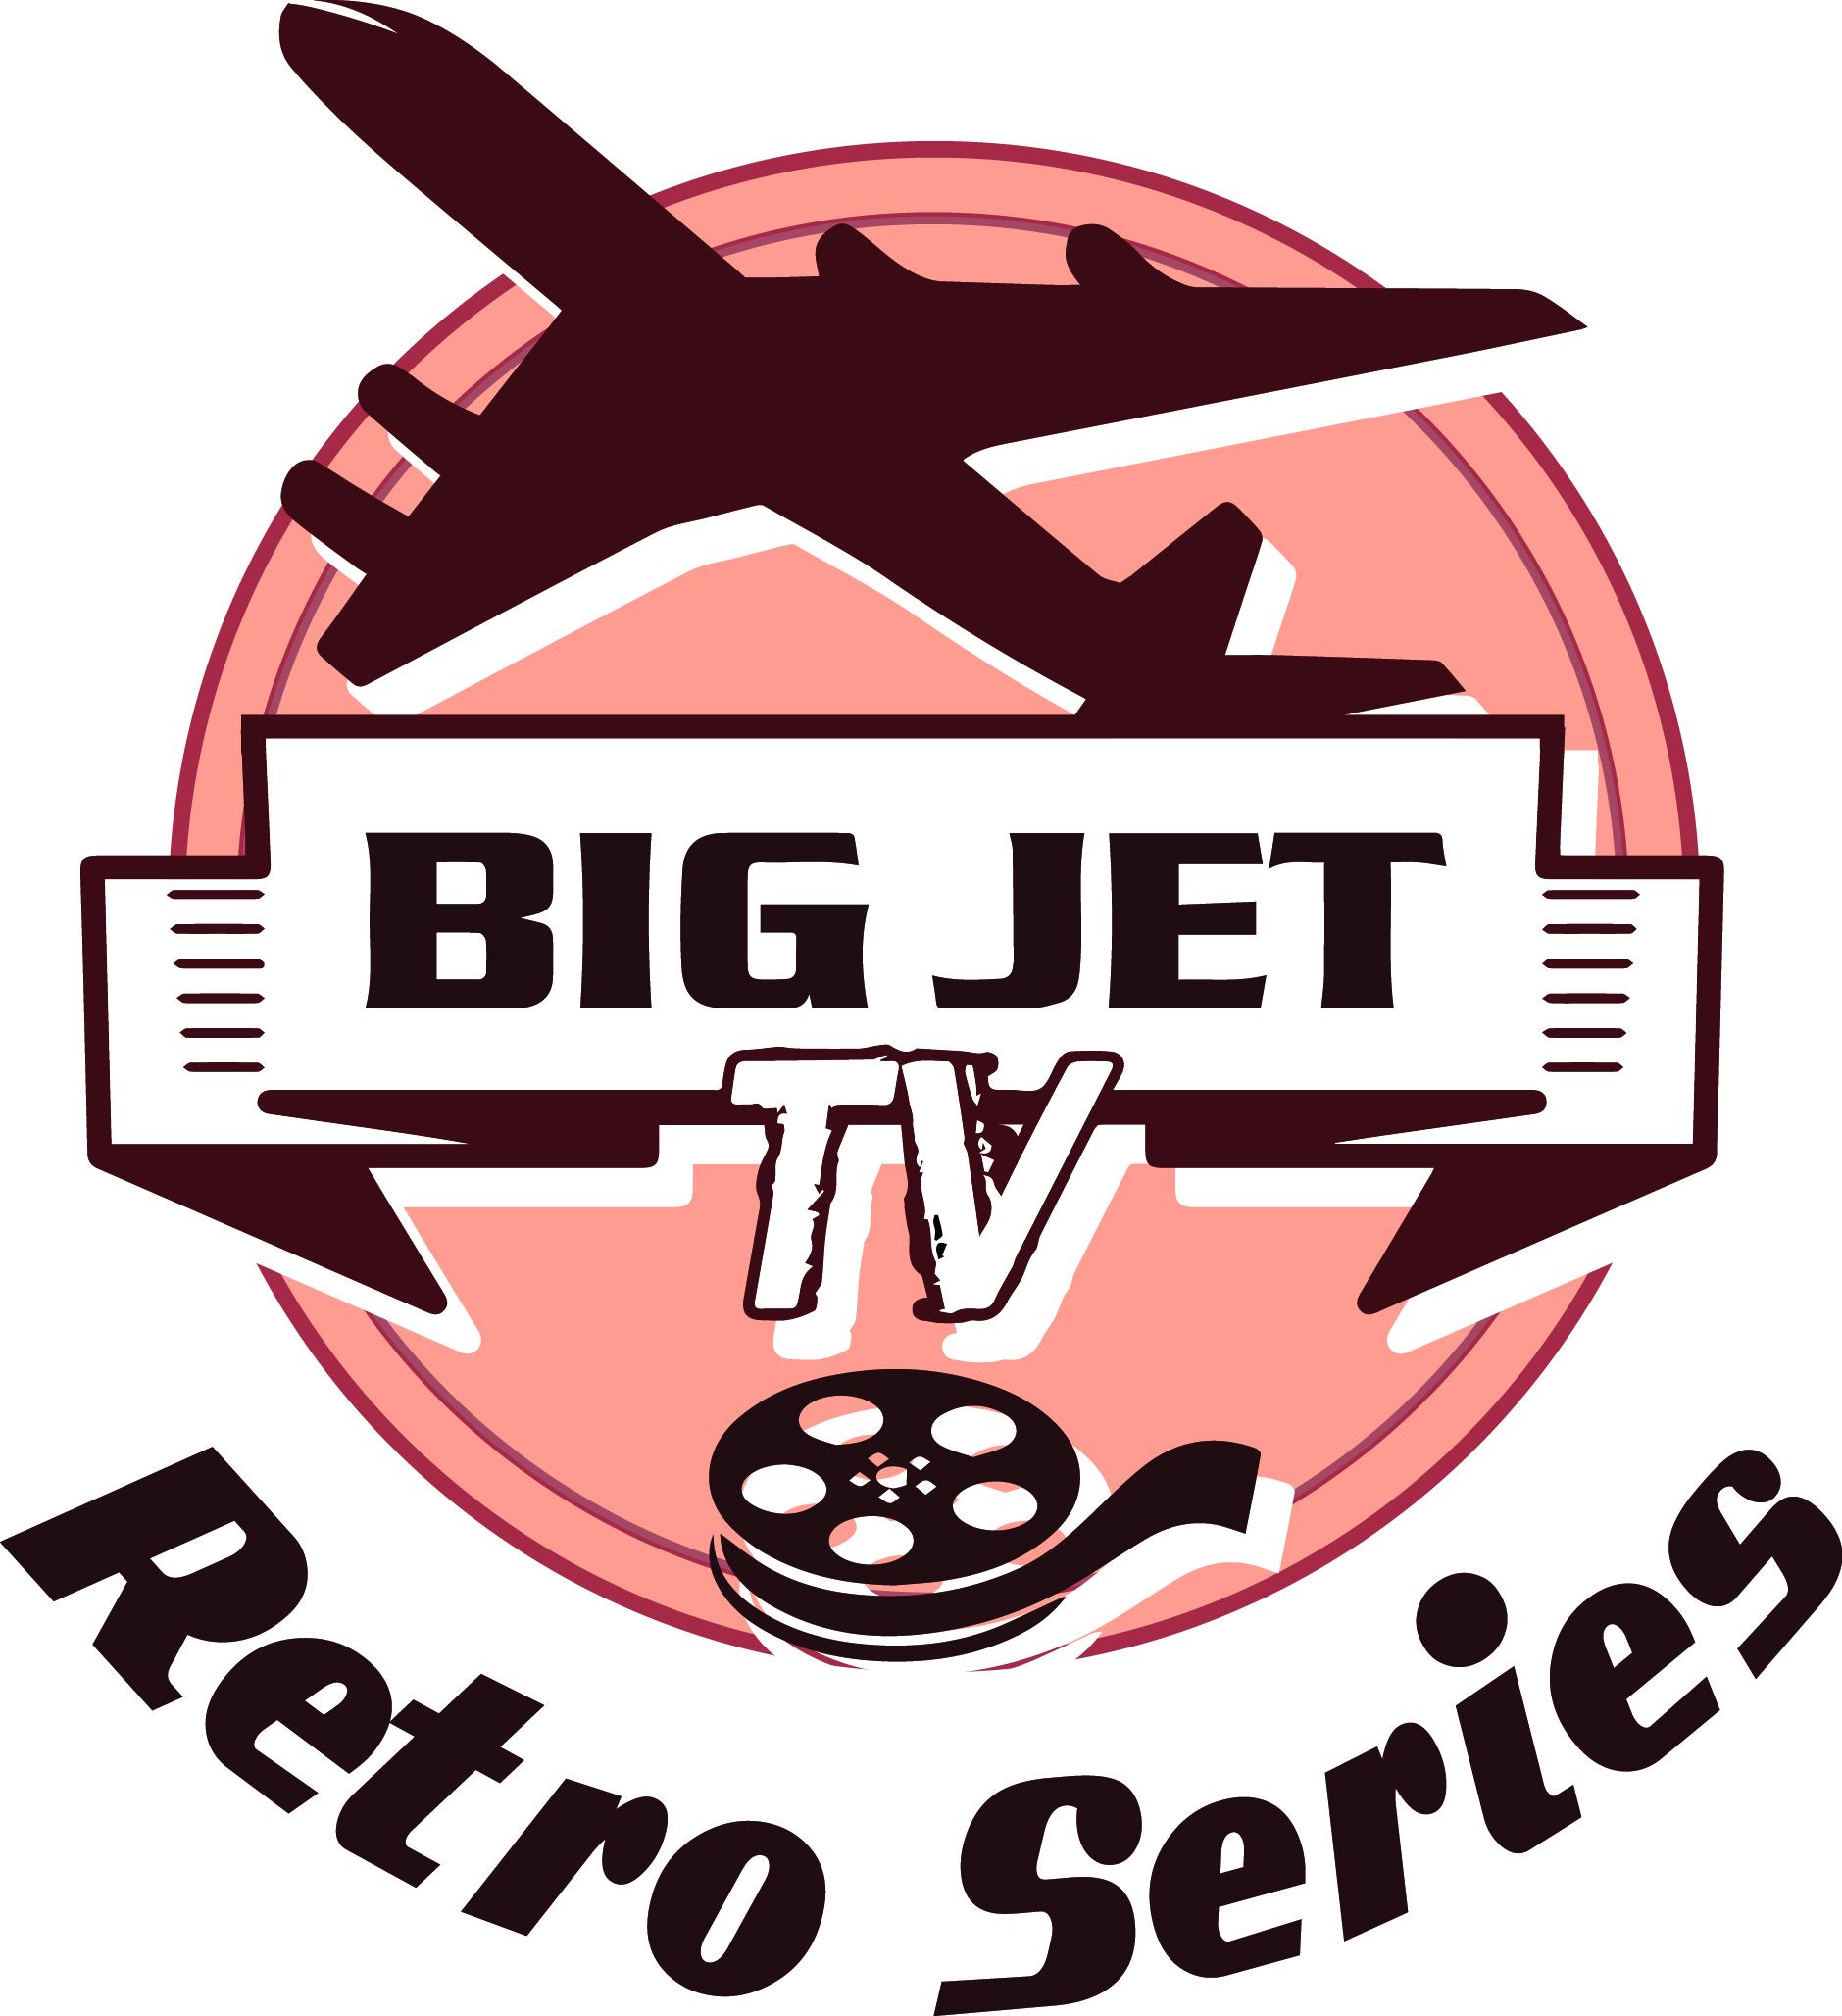 retro-series-logo.jpg